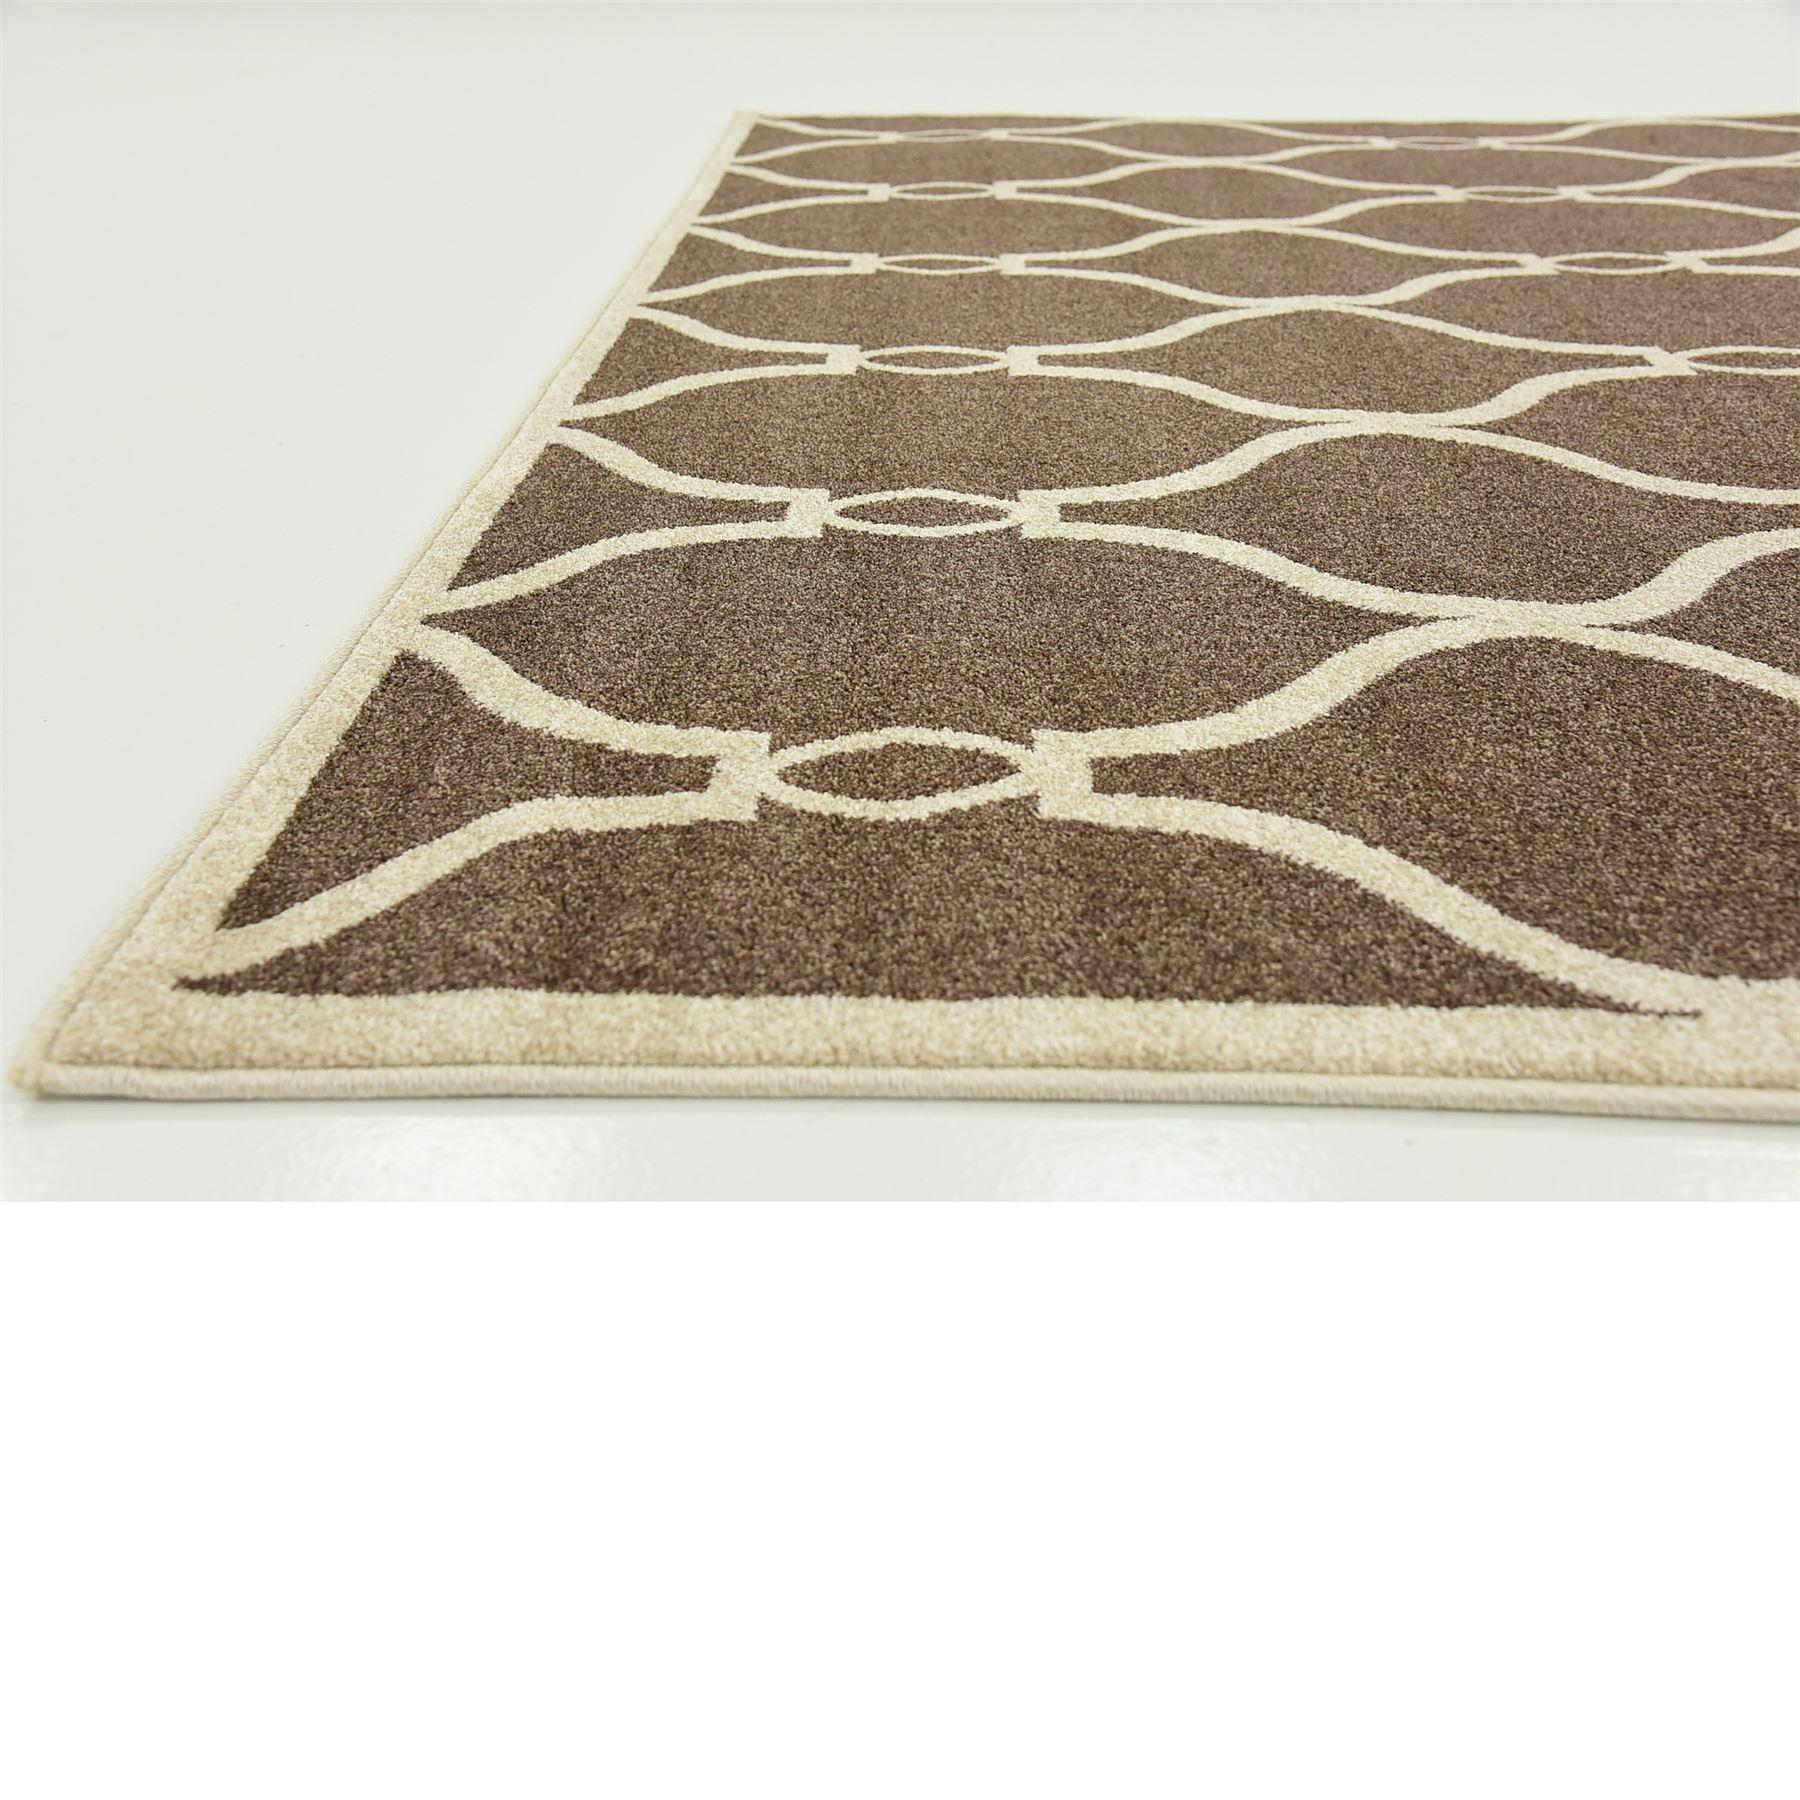 a2z rug modern trellis area rugs modern carpet all sizes. Black Bedroom Furniture Sets. Home Design Ideas